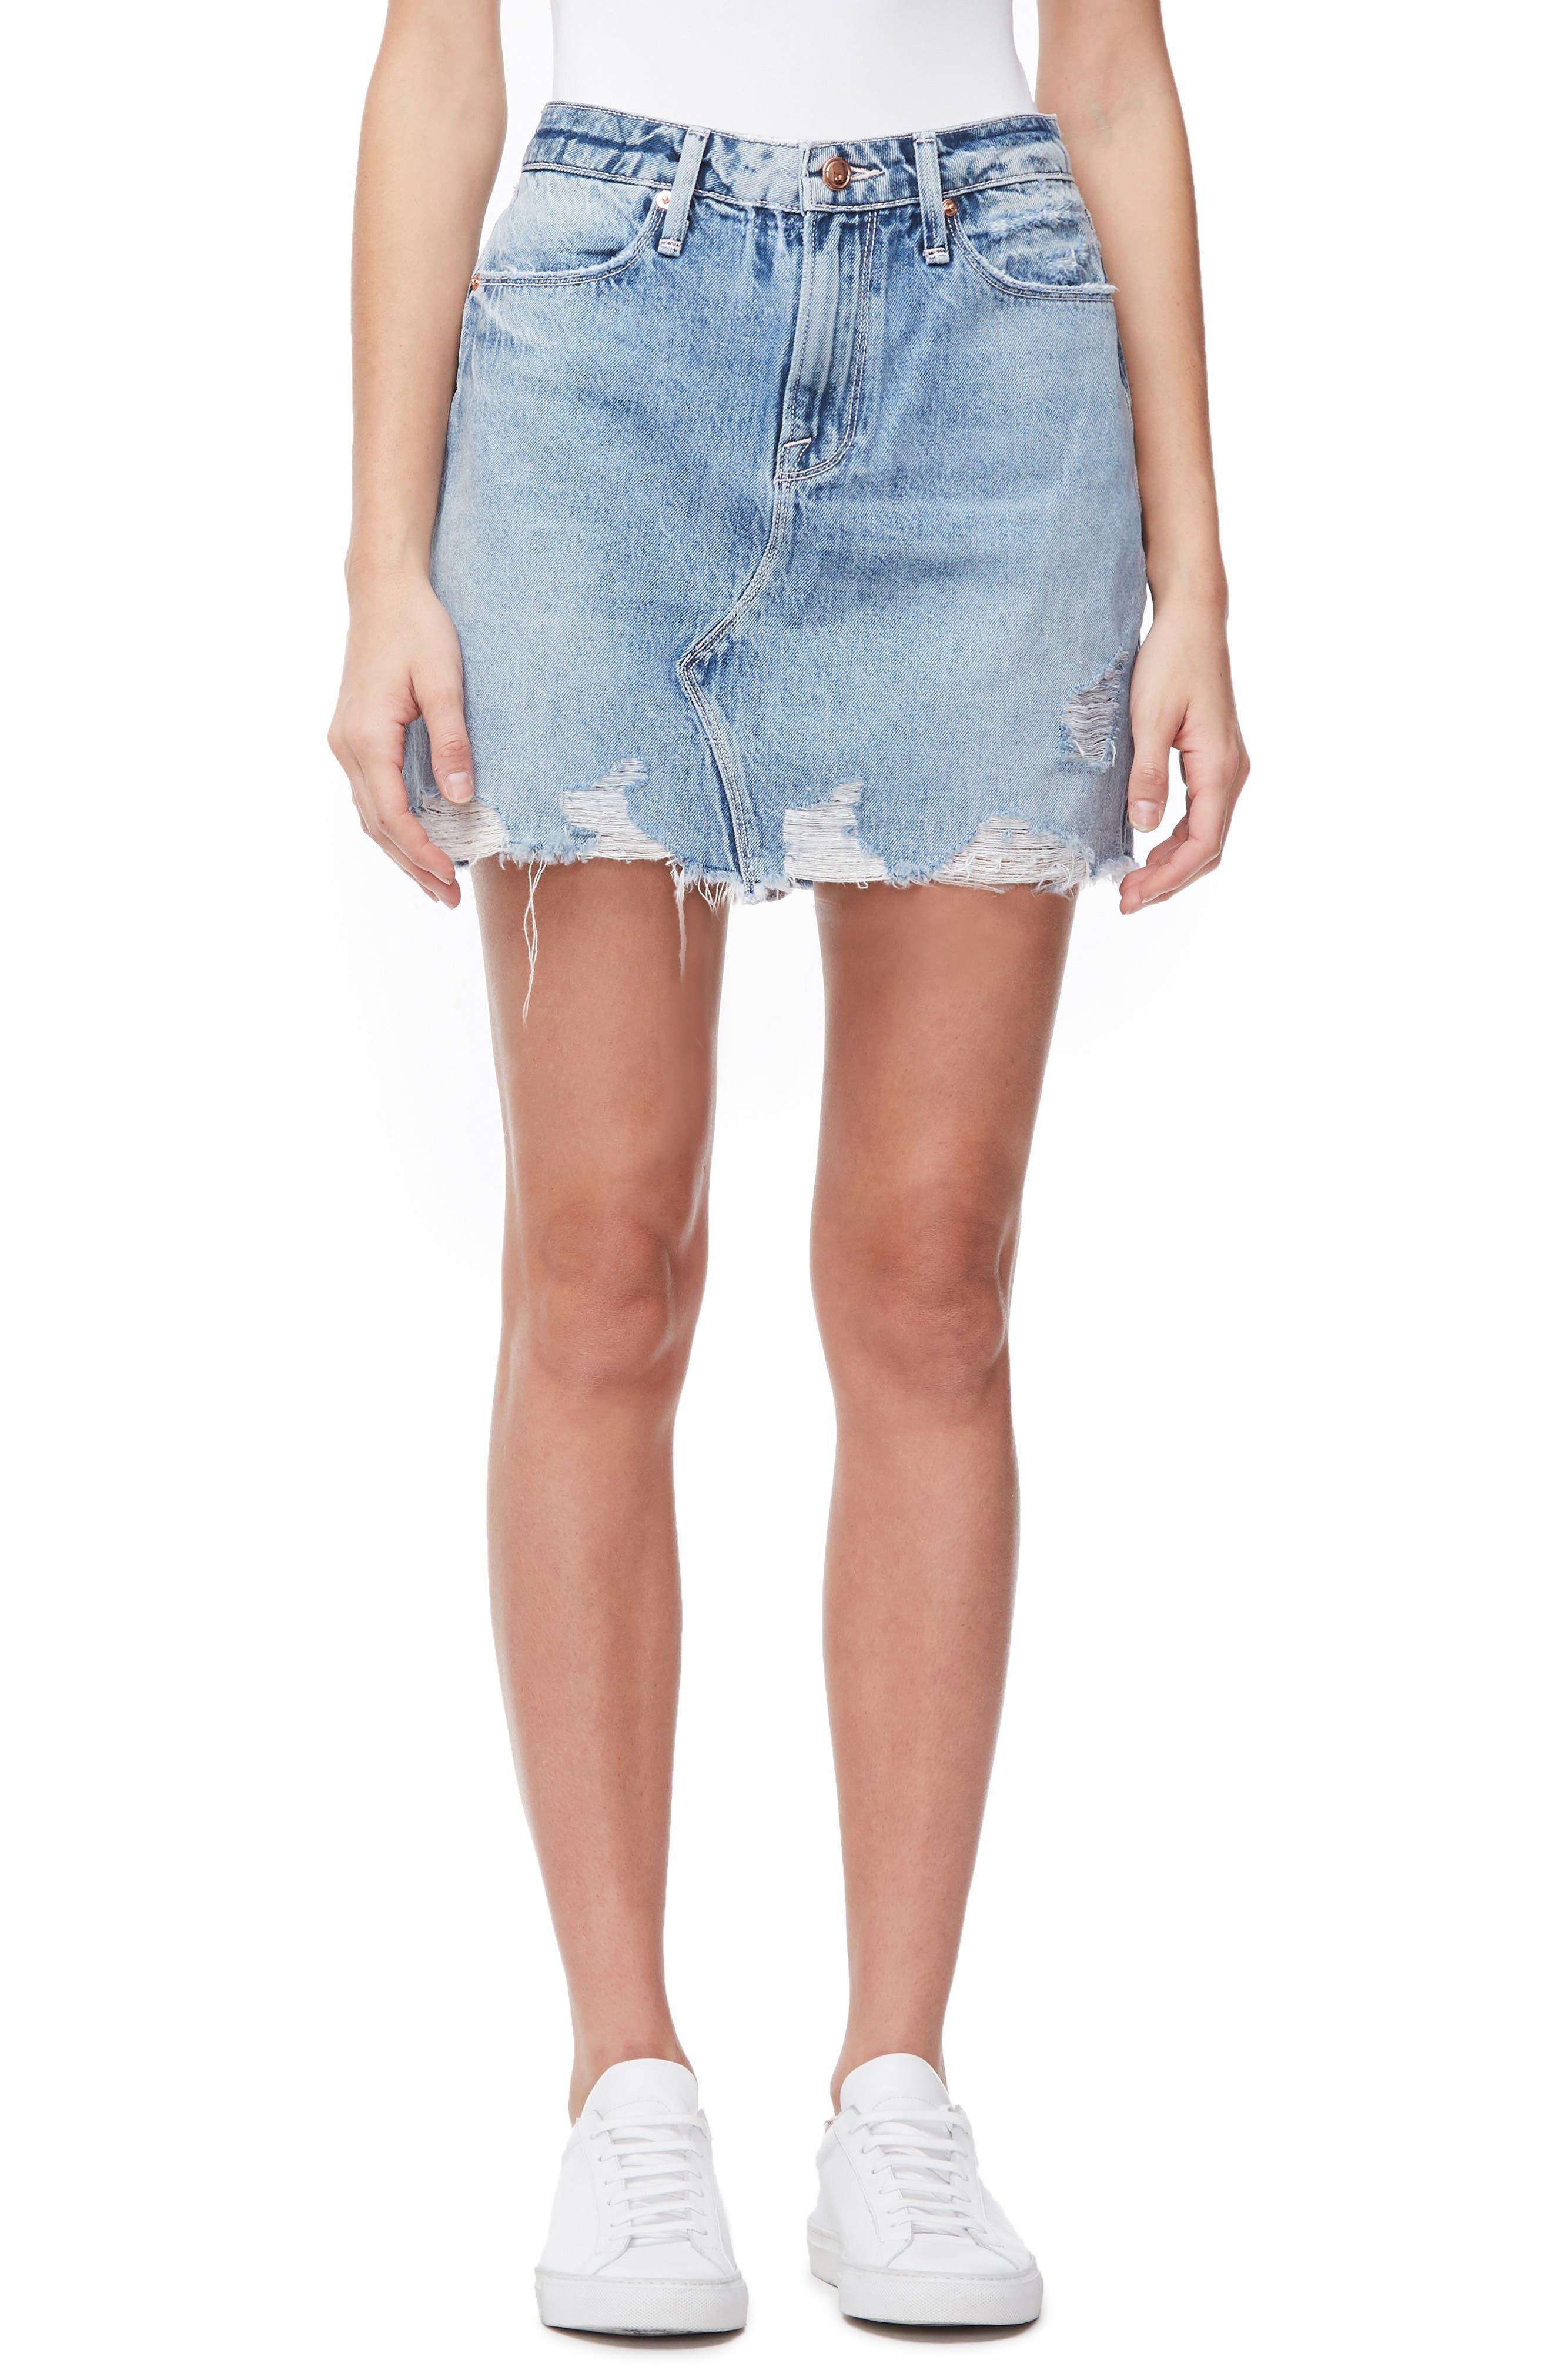 048c0d65 Celebrity Pink Women's Juniors High Waist Distressed Denim Mini Skirt (11,  Black)